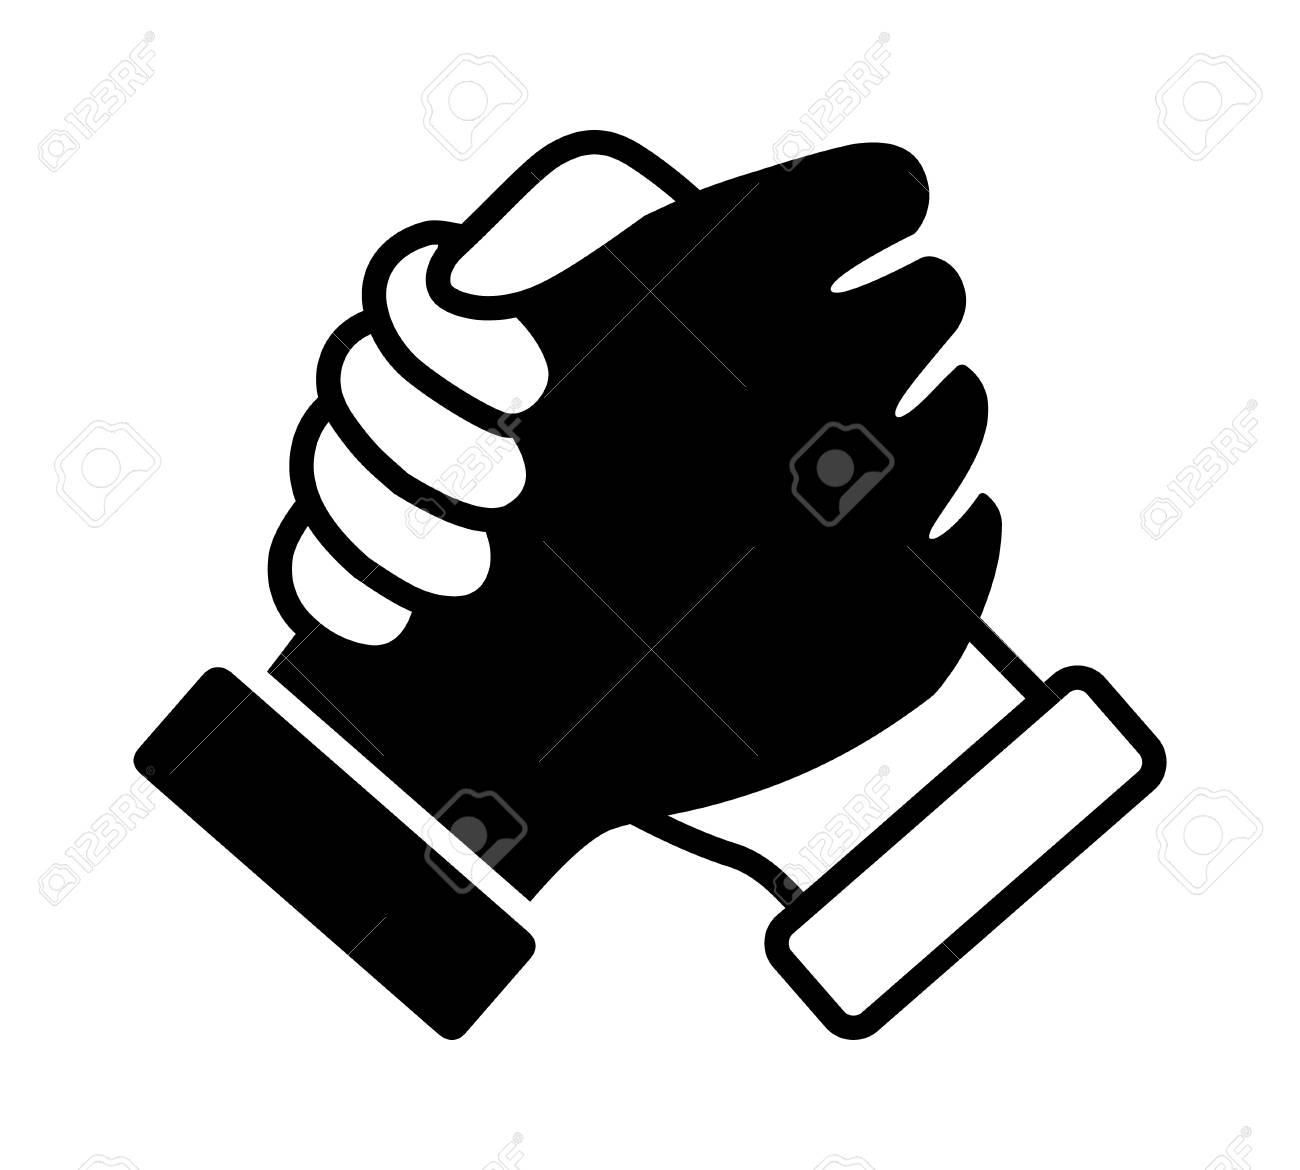 Interracial soul brother handshake, thumb clasp handshake or homie handshake flat vector icon - 120162078